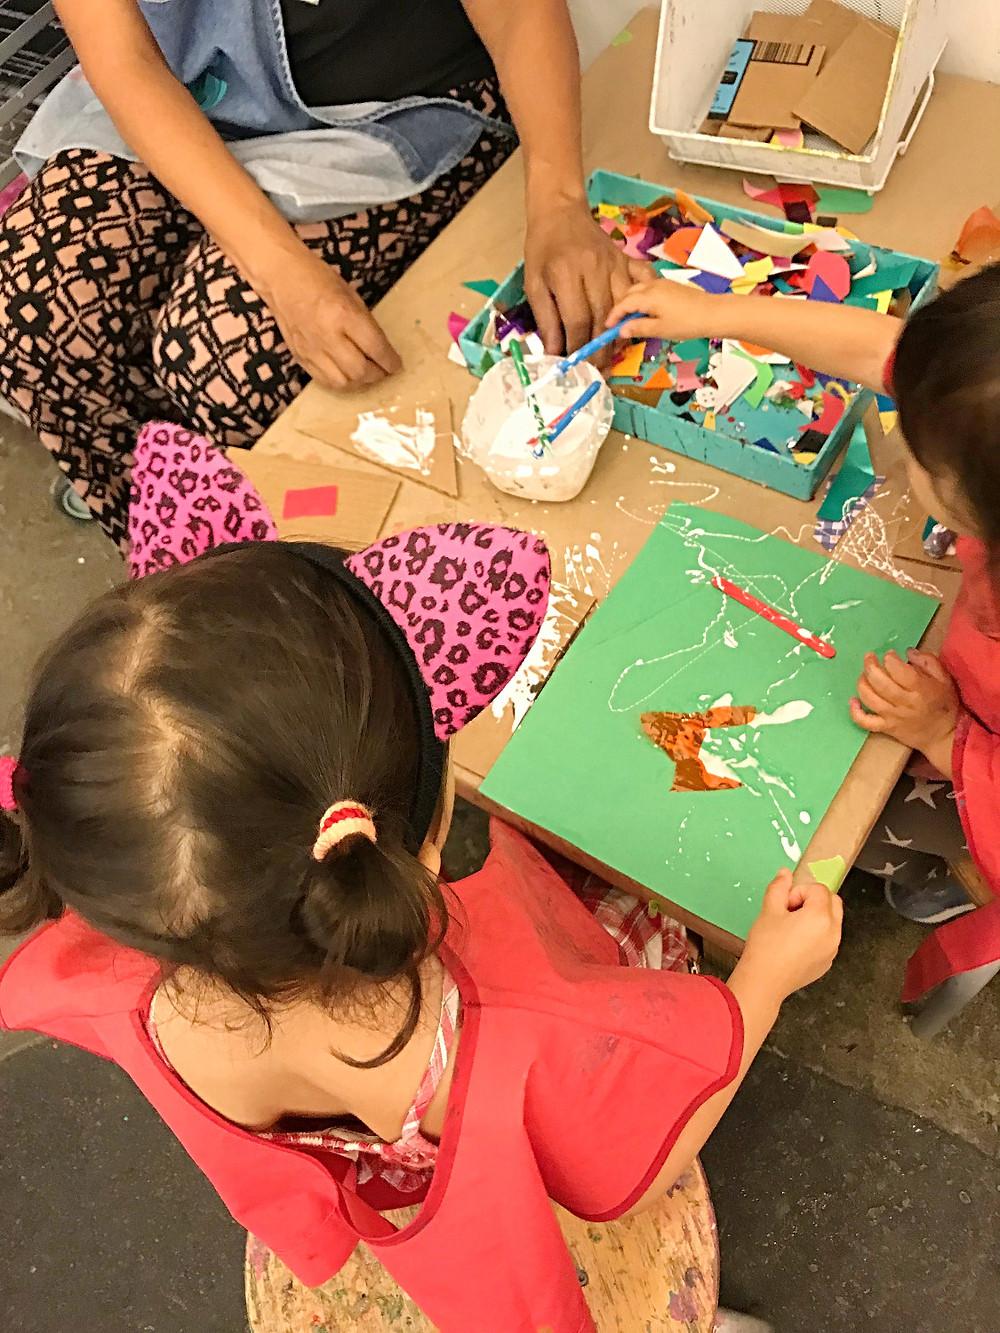 children's museum of the arts, children's museum, art, kids art, creative kids, nyc kids, summer break, nyc summer, mom blogger